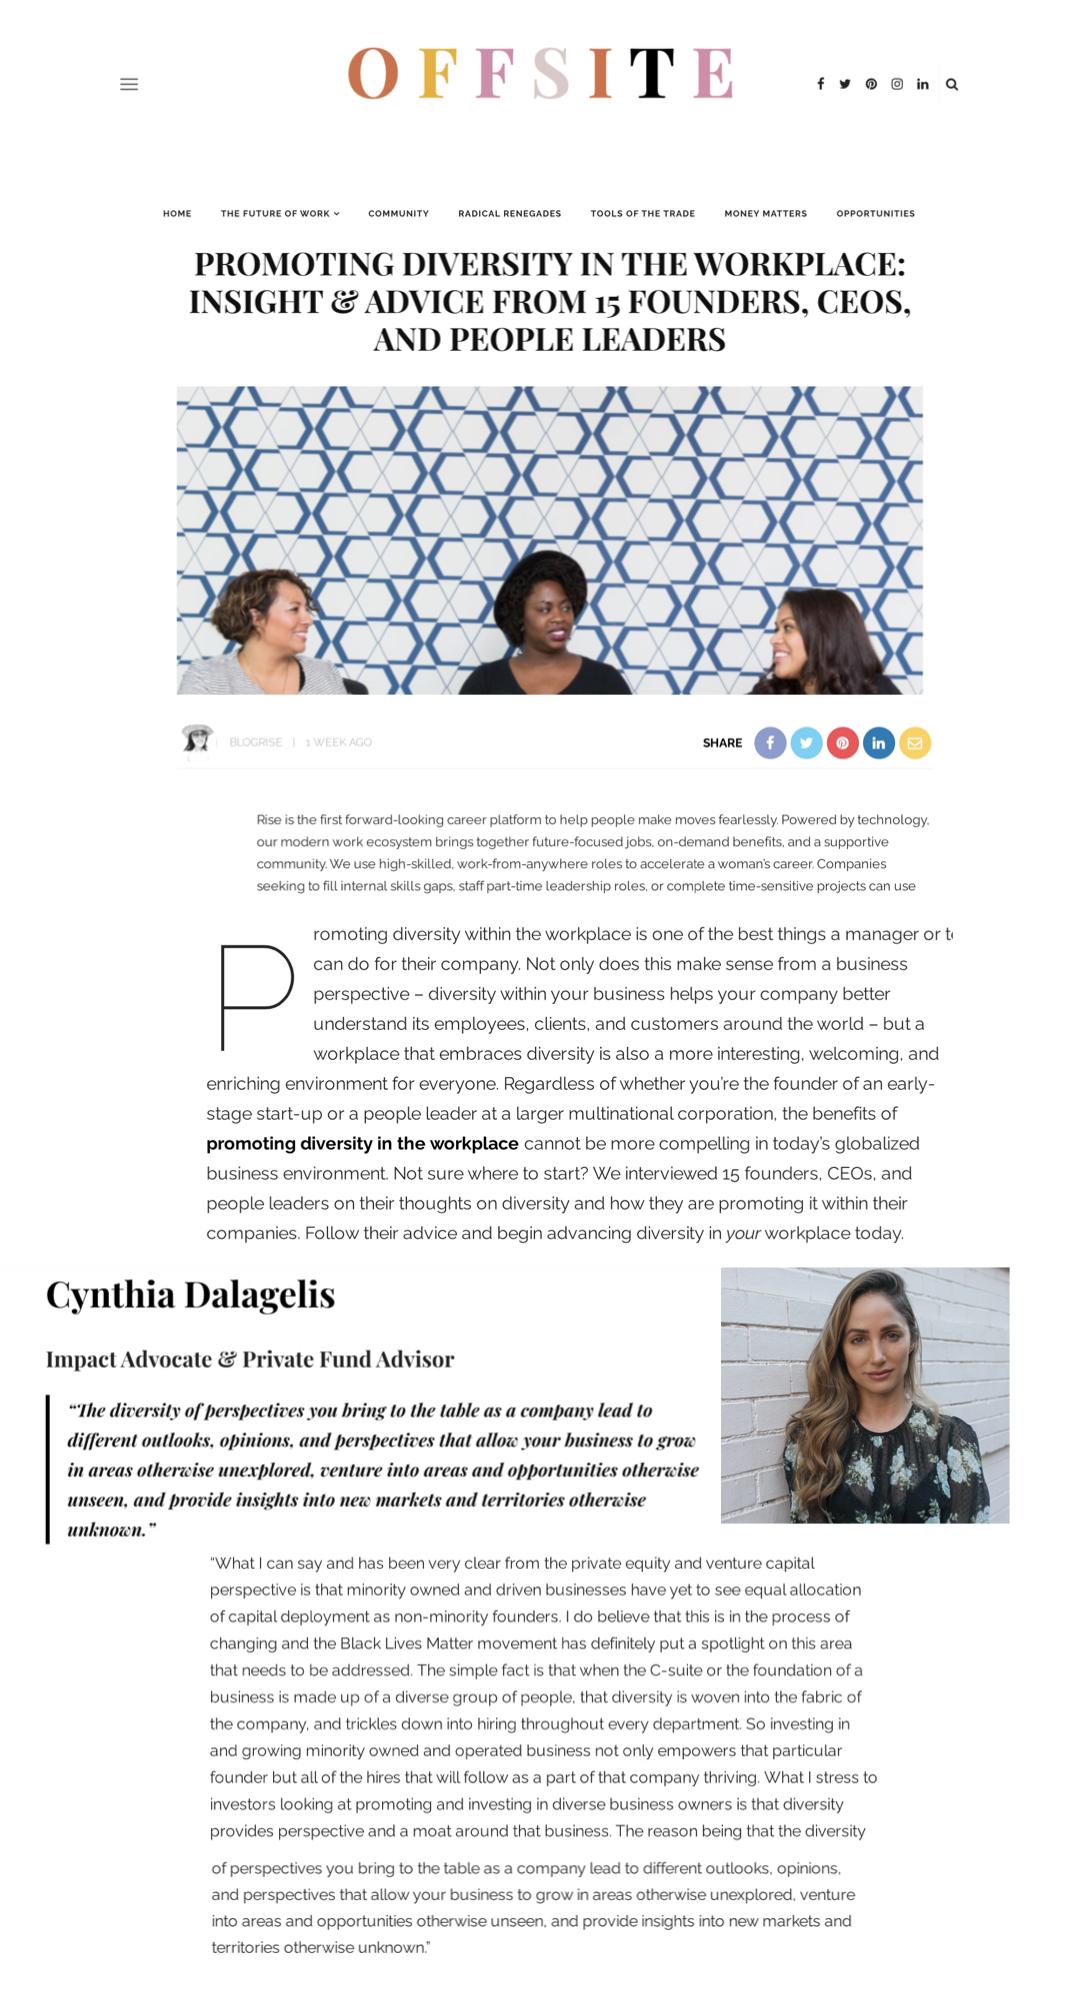 Cynthia Dalagelis